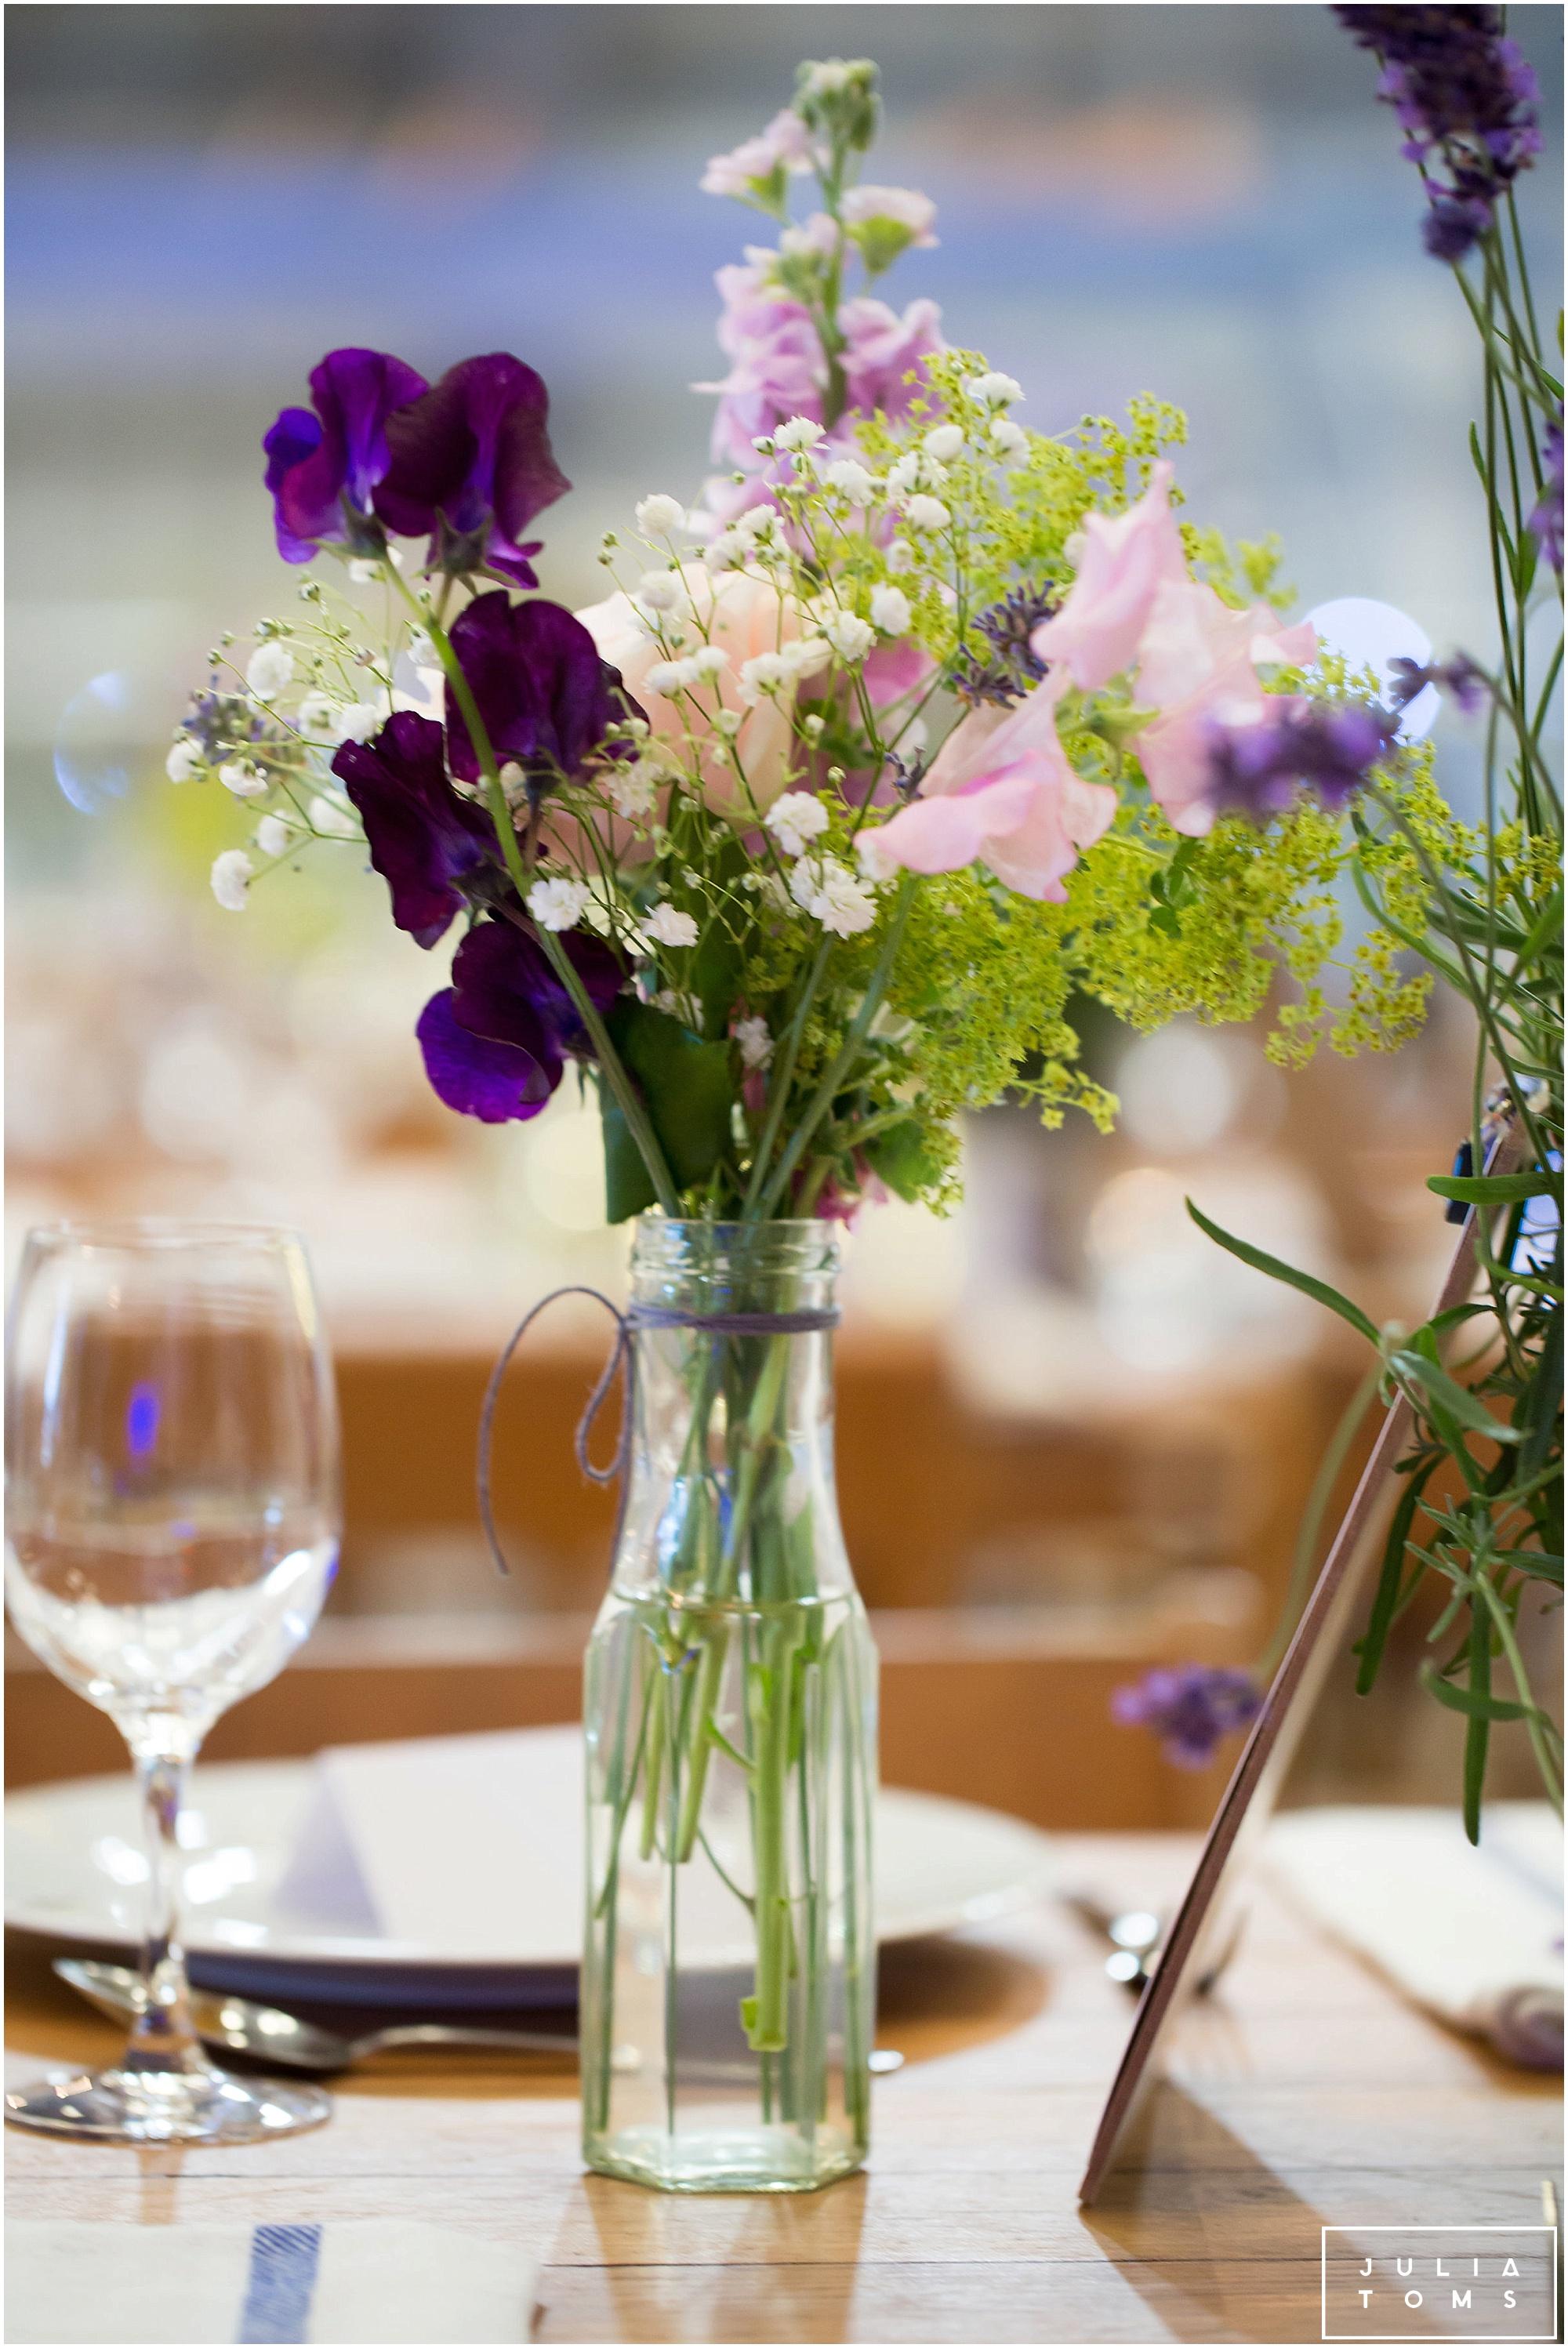 julia_toms_chichester_wedding_photographer_portsmouth_051.jpg